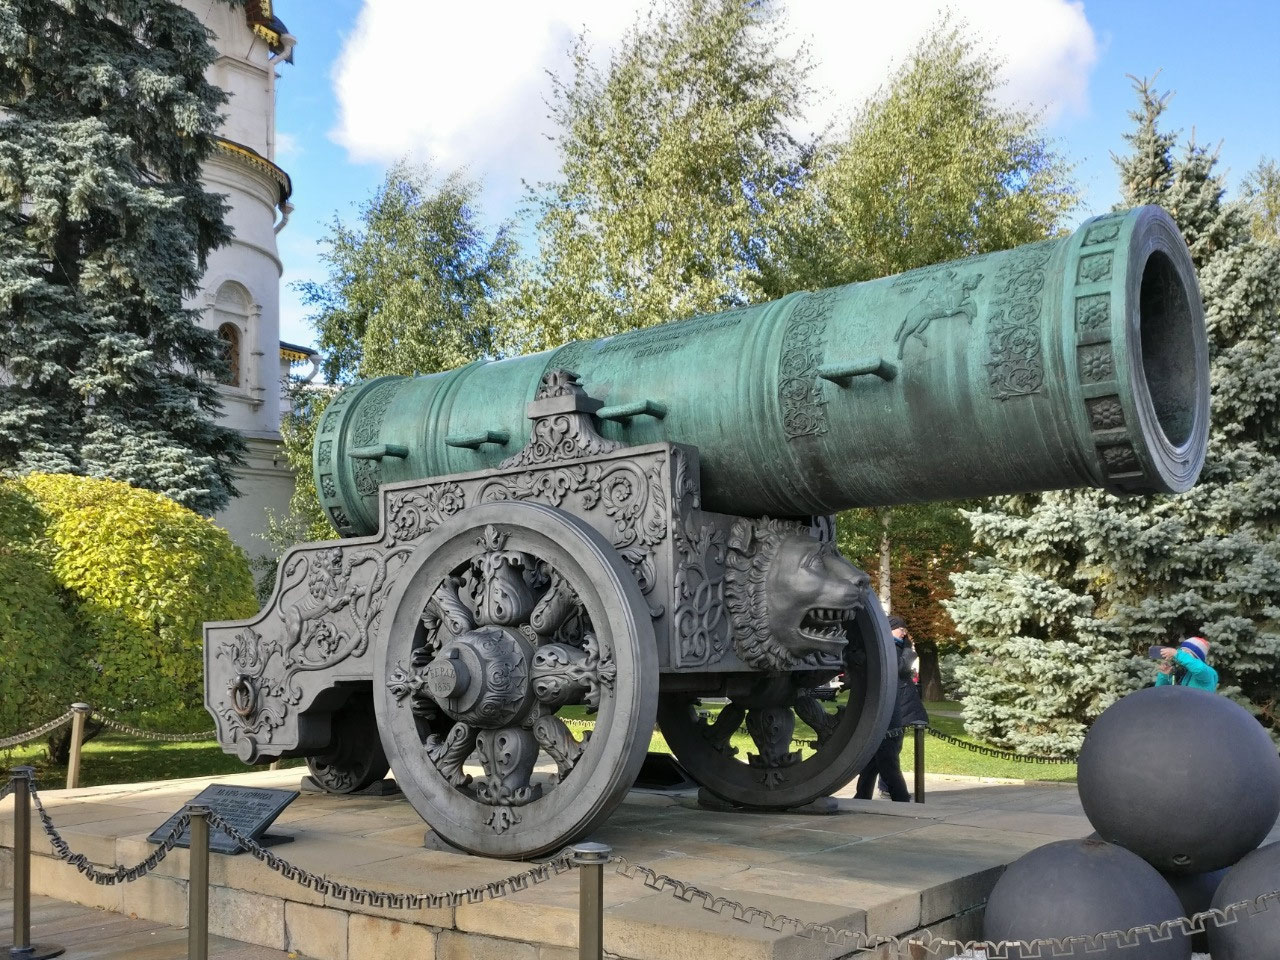 Tsar's Cannon